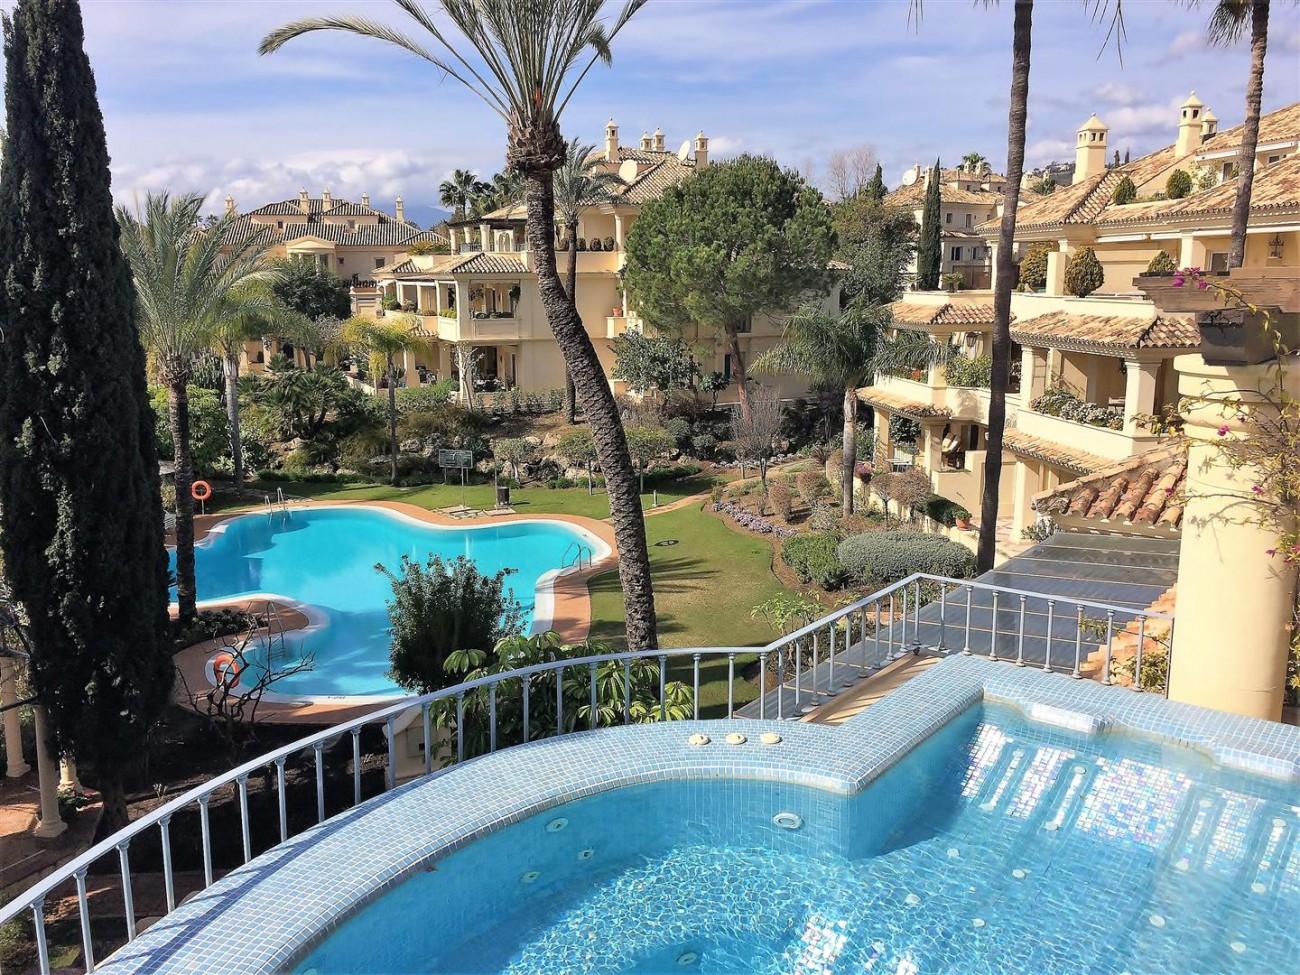 Penthouse for sale Las Alamandas Nueva Andalucia Marbella Spain (21) (Large)